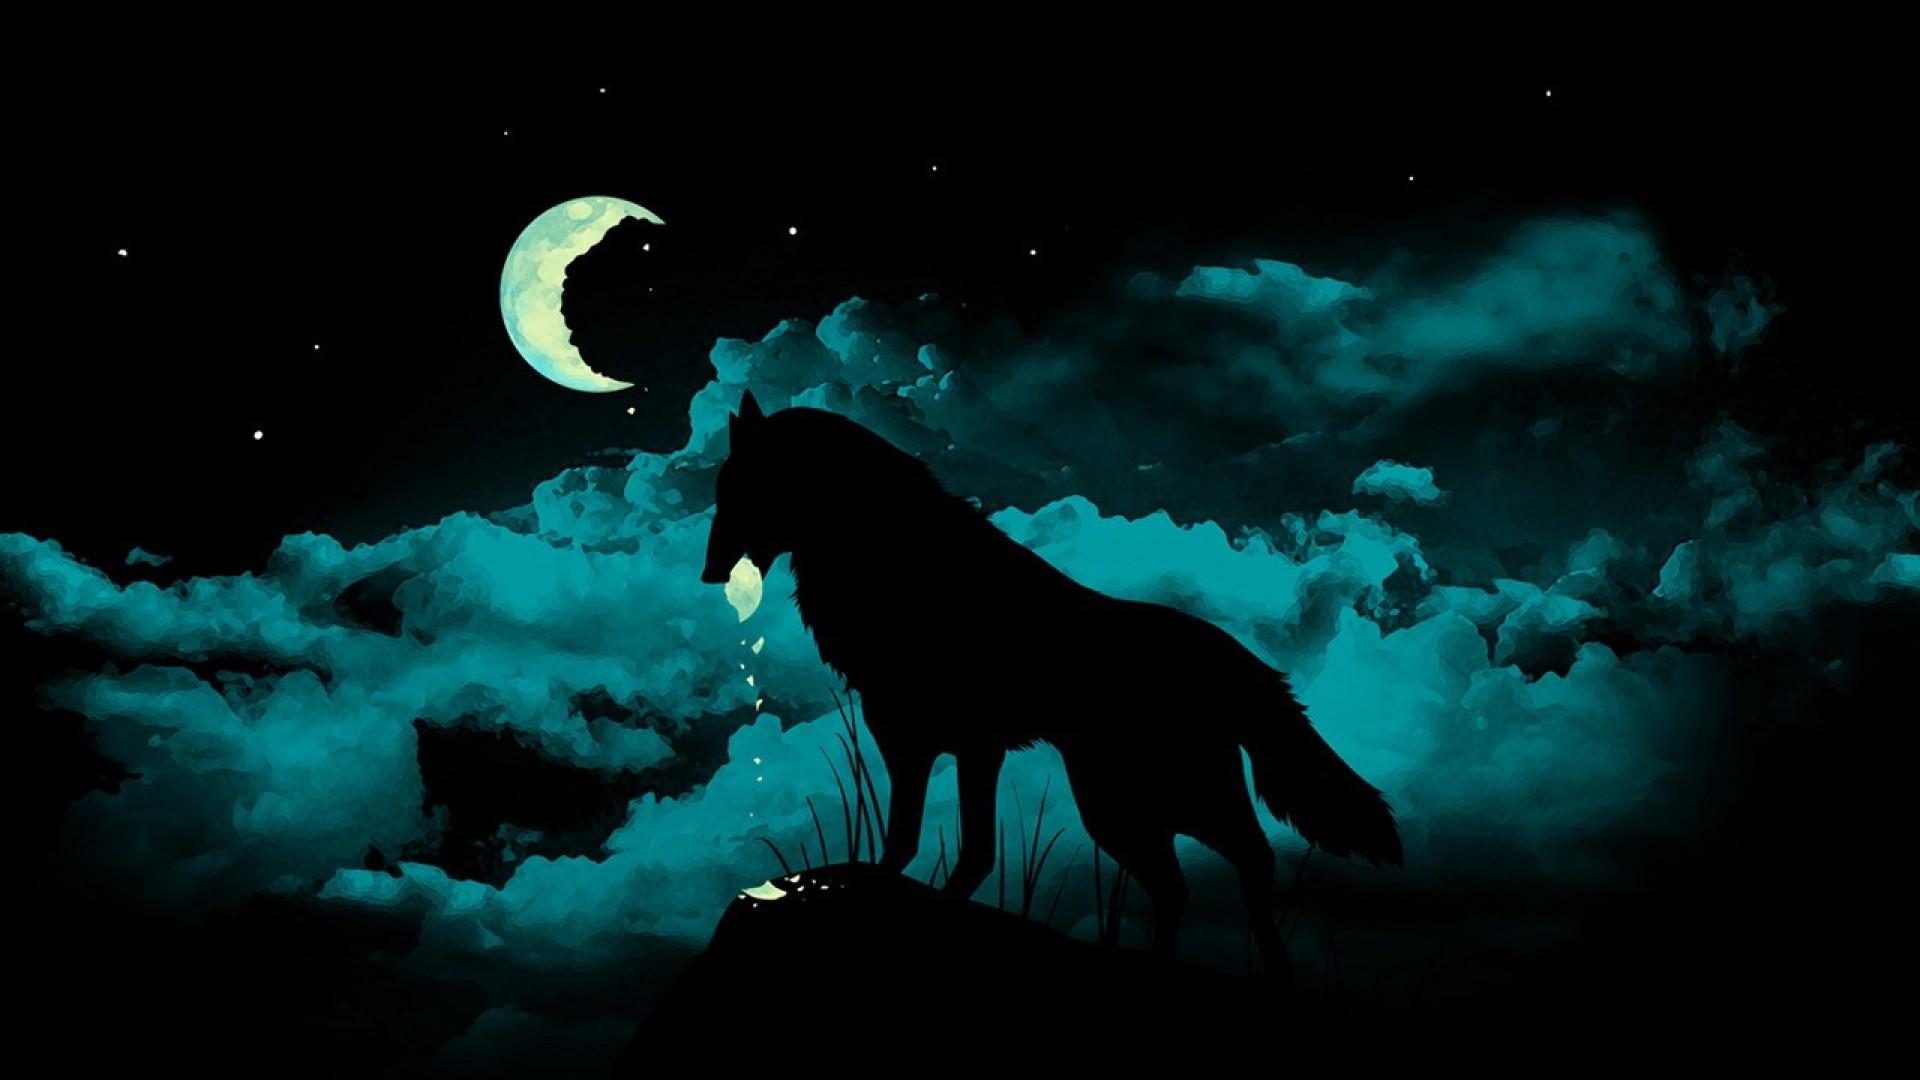 Wolf Hd Wallpapers 1080P – Desktop Backgrounds